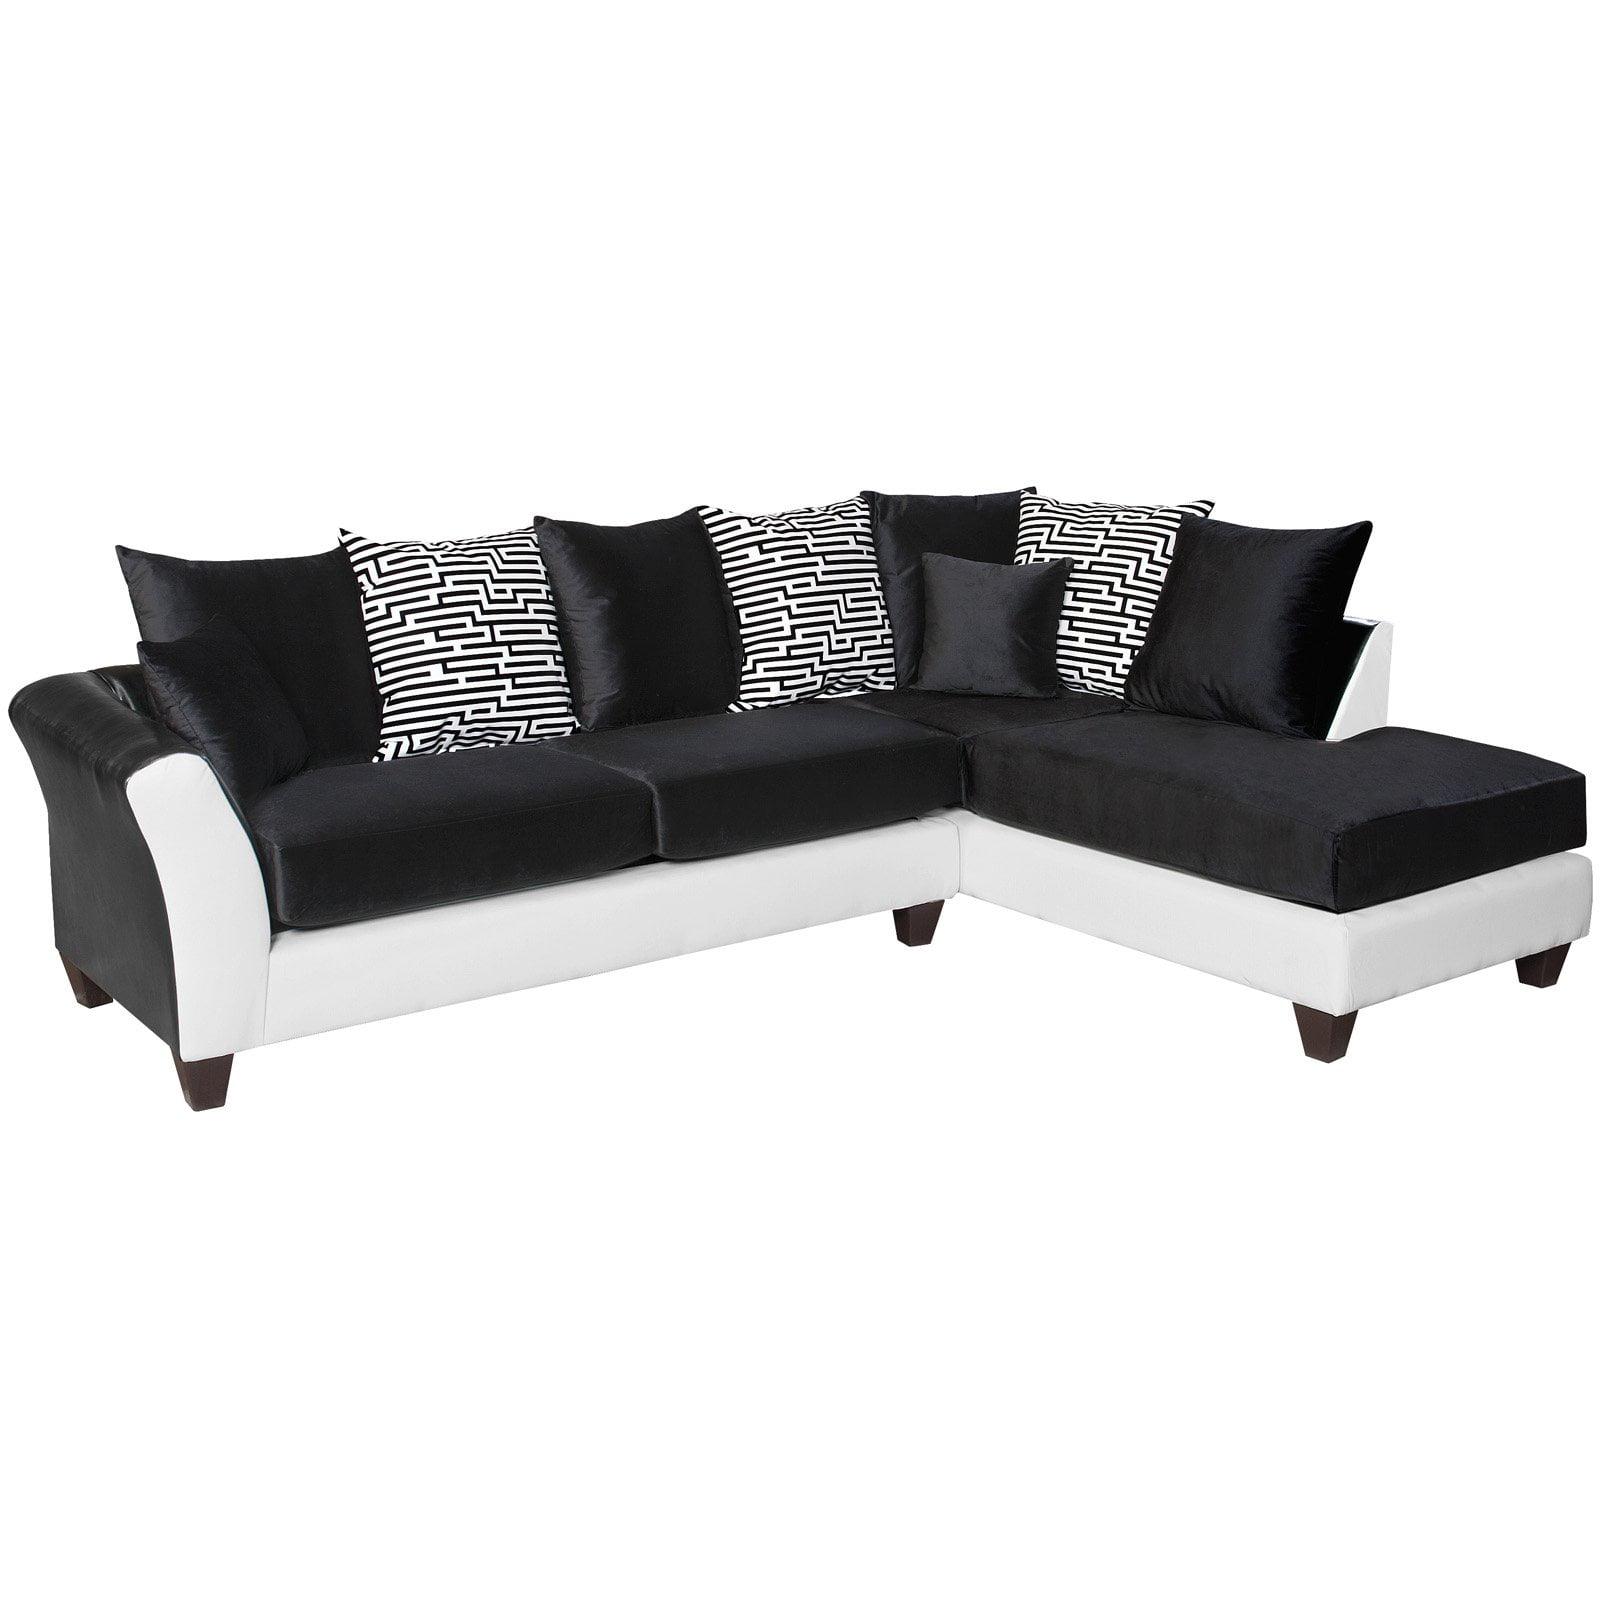 Flash Furniture Riverstone Implosion Velvet Sectional Sofa